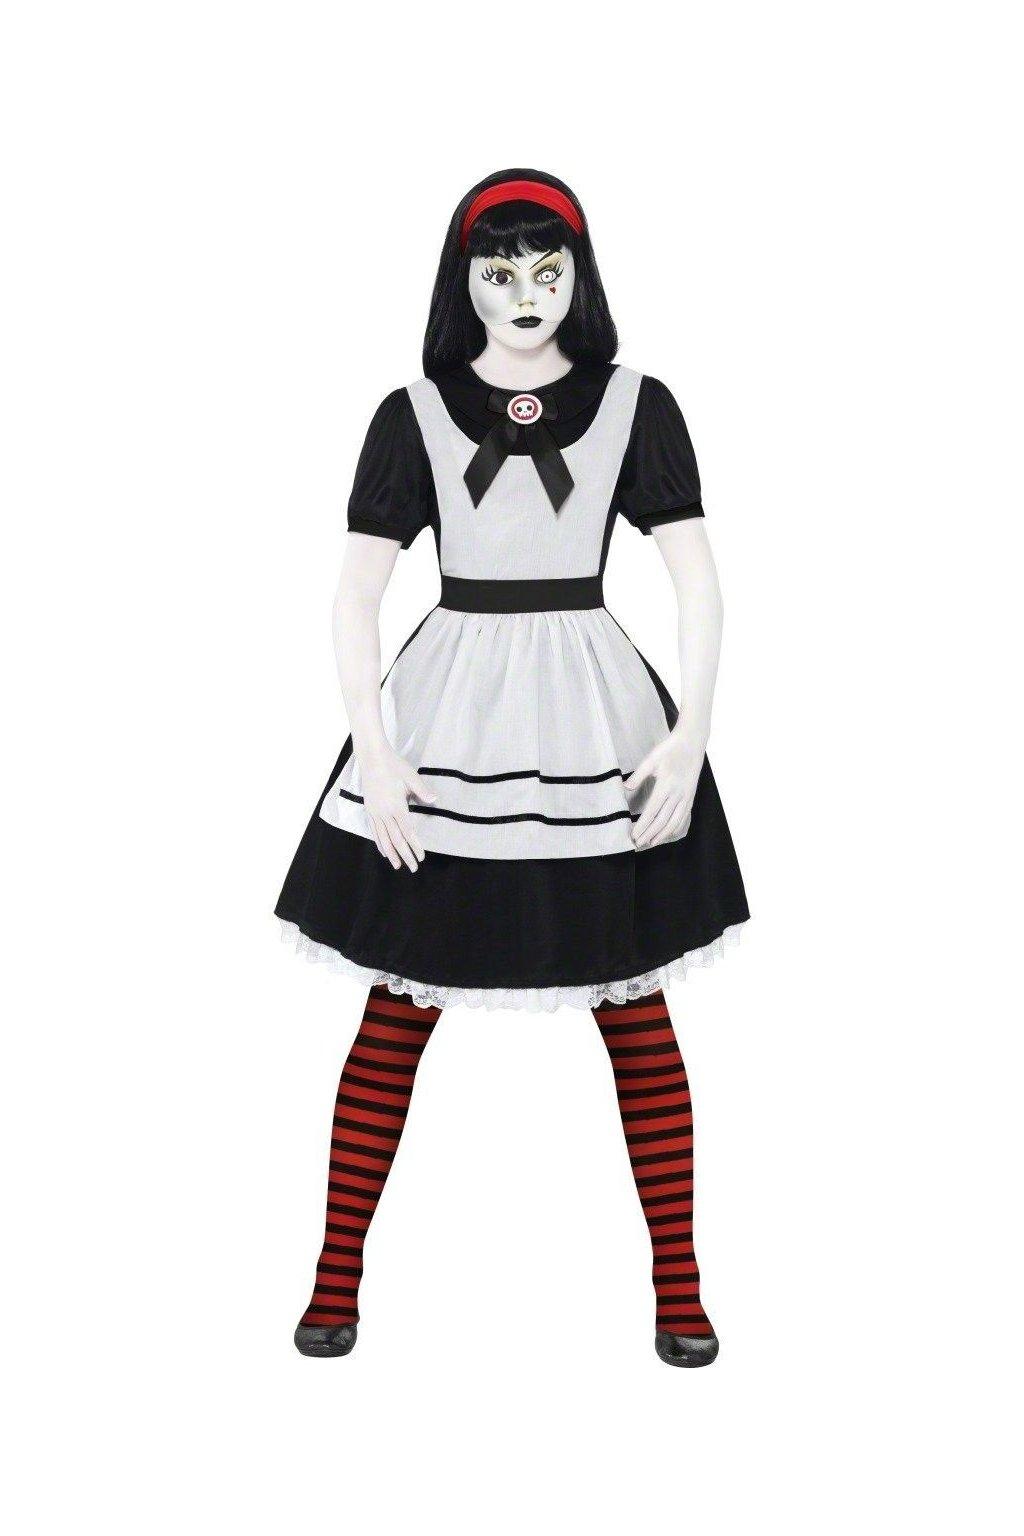 Alice in Wonderland - Living Dead Dolls